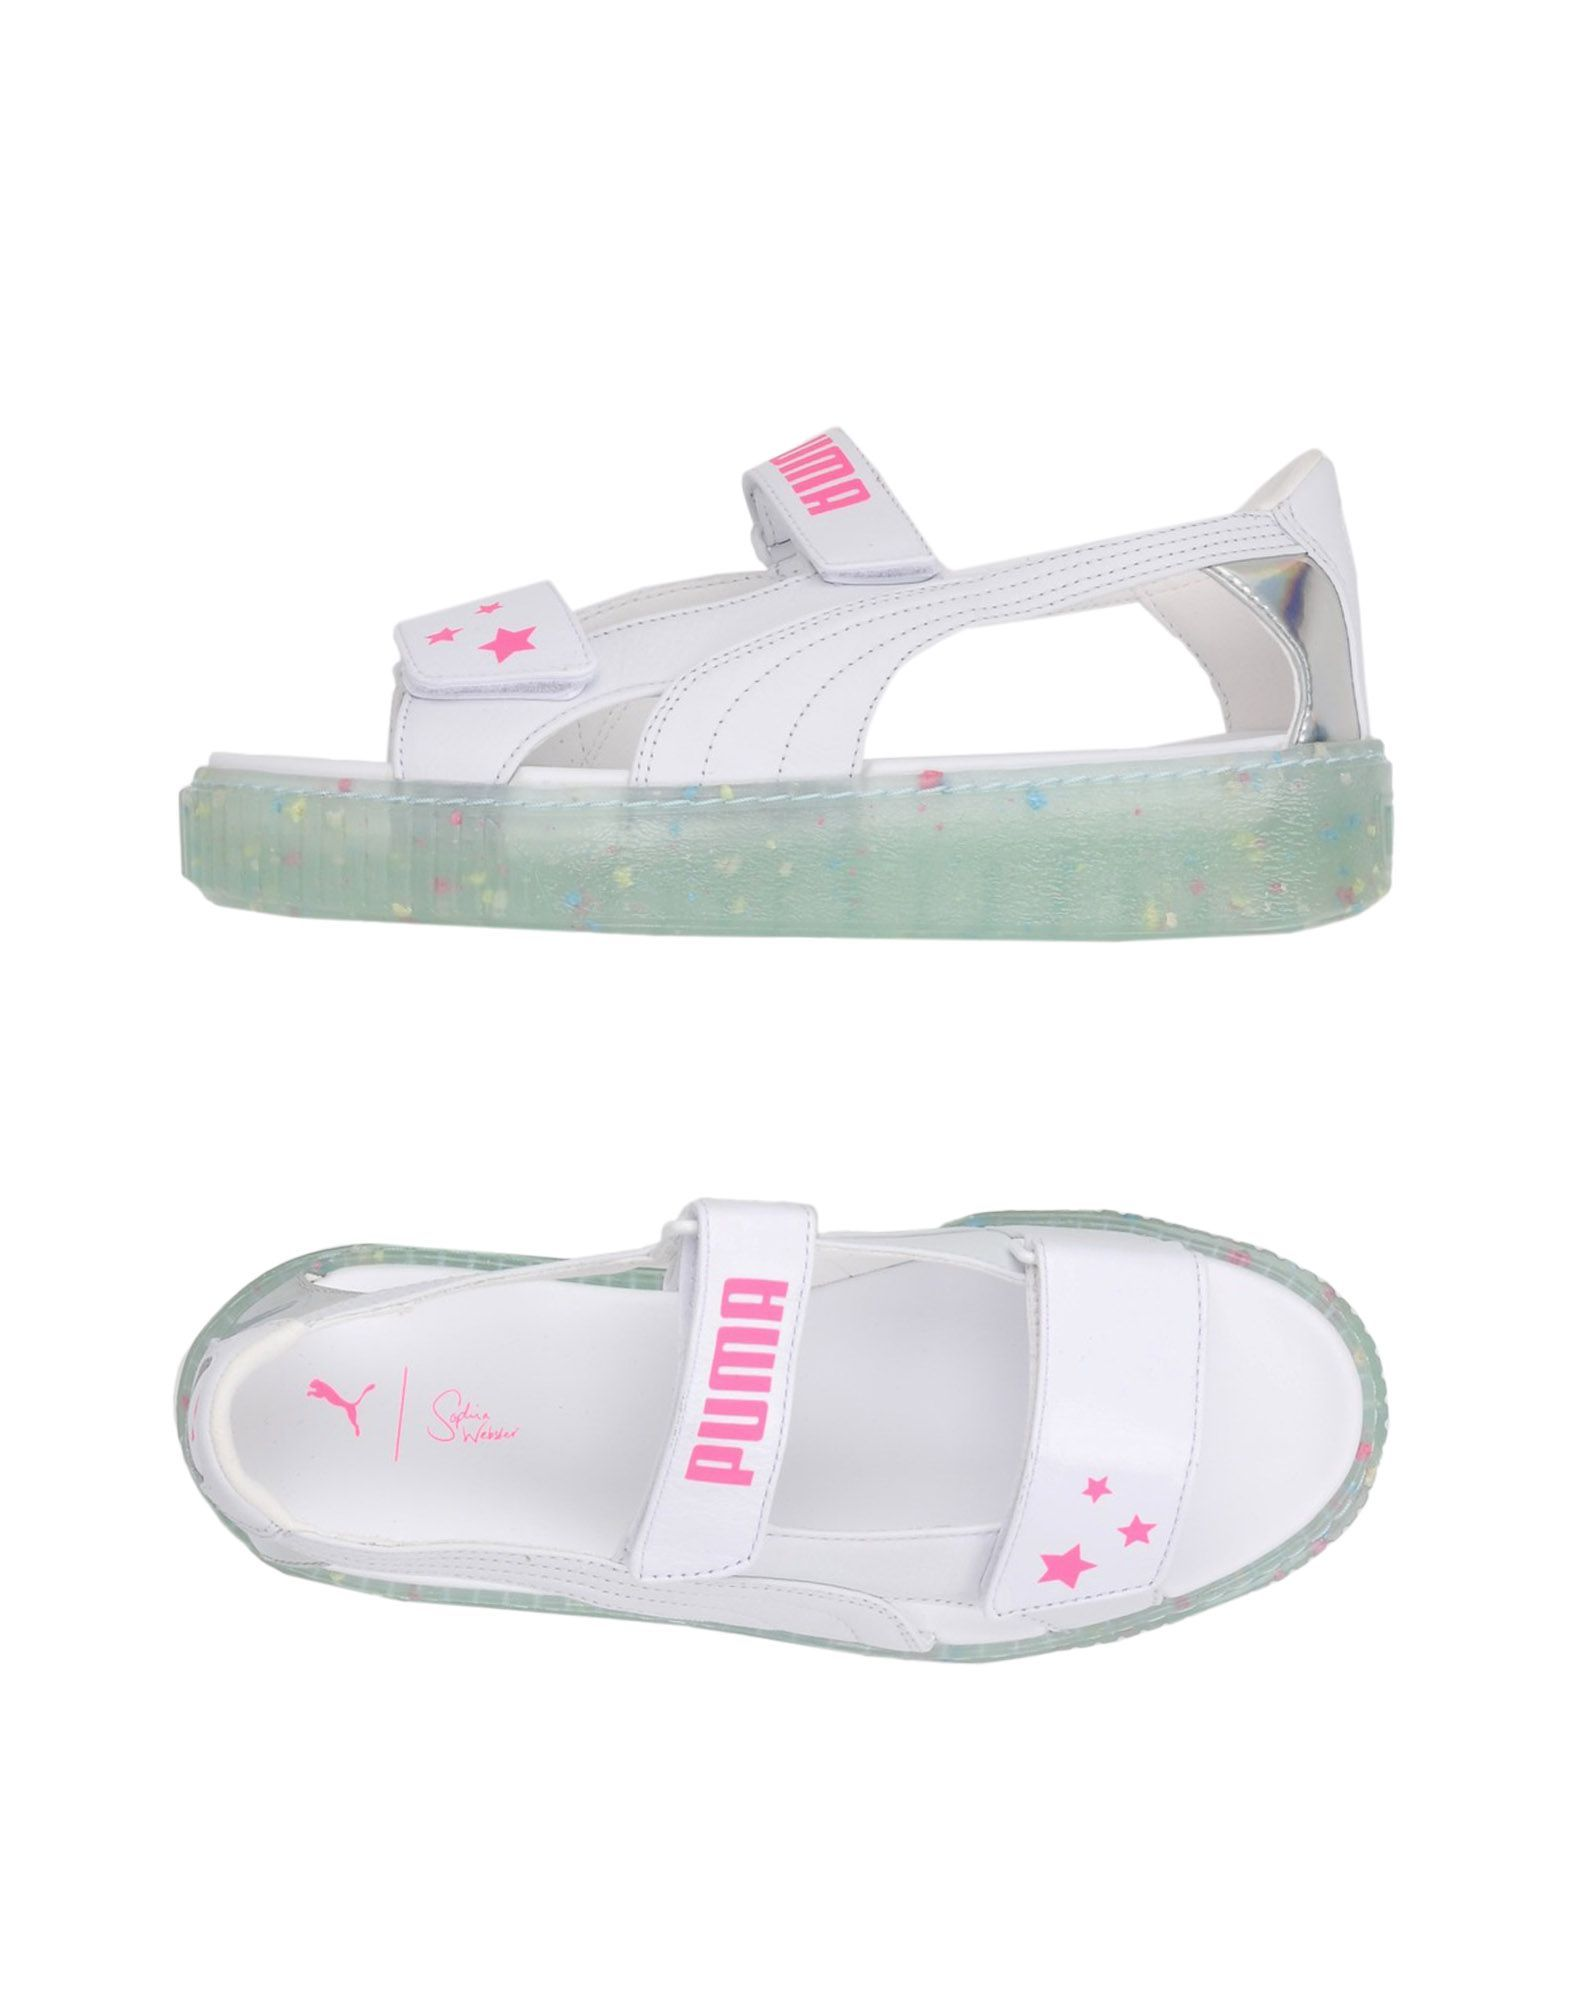 6bcc24eefc23 PUMA X SOPHIA WEBSTER .  pumaxsophiawebster  shoes